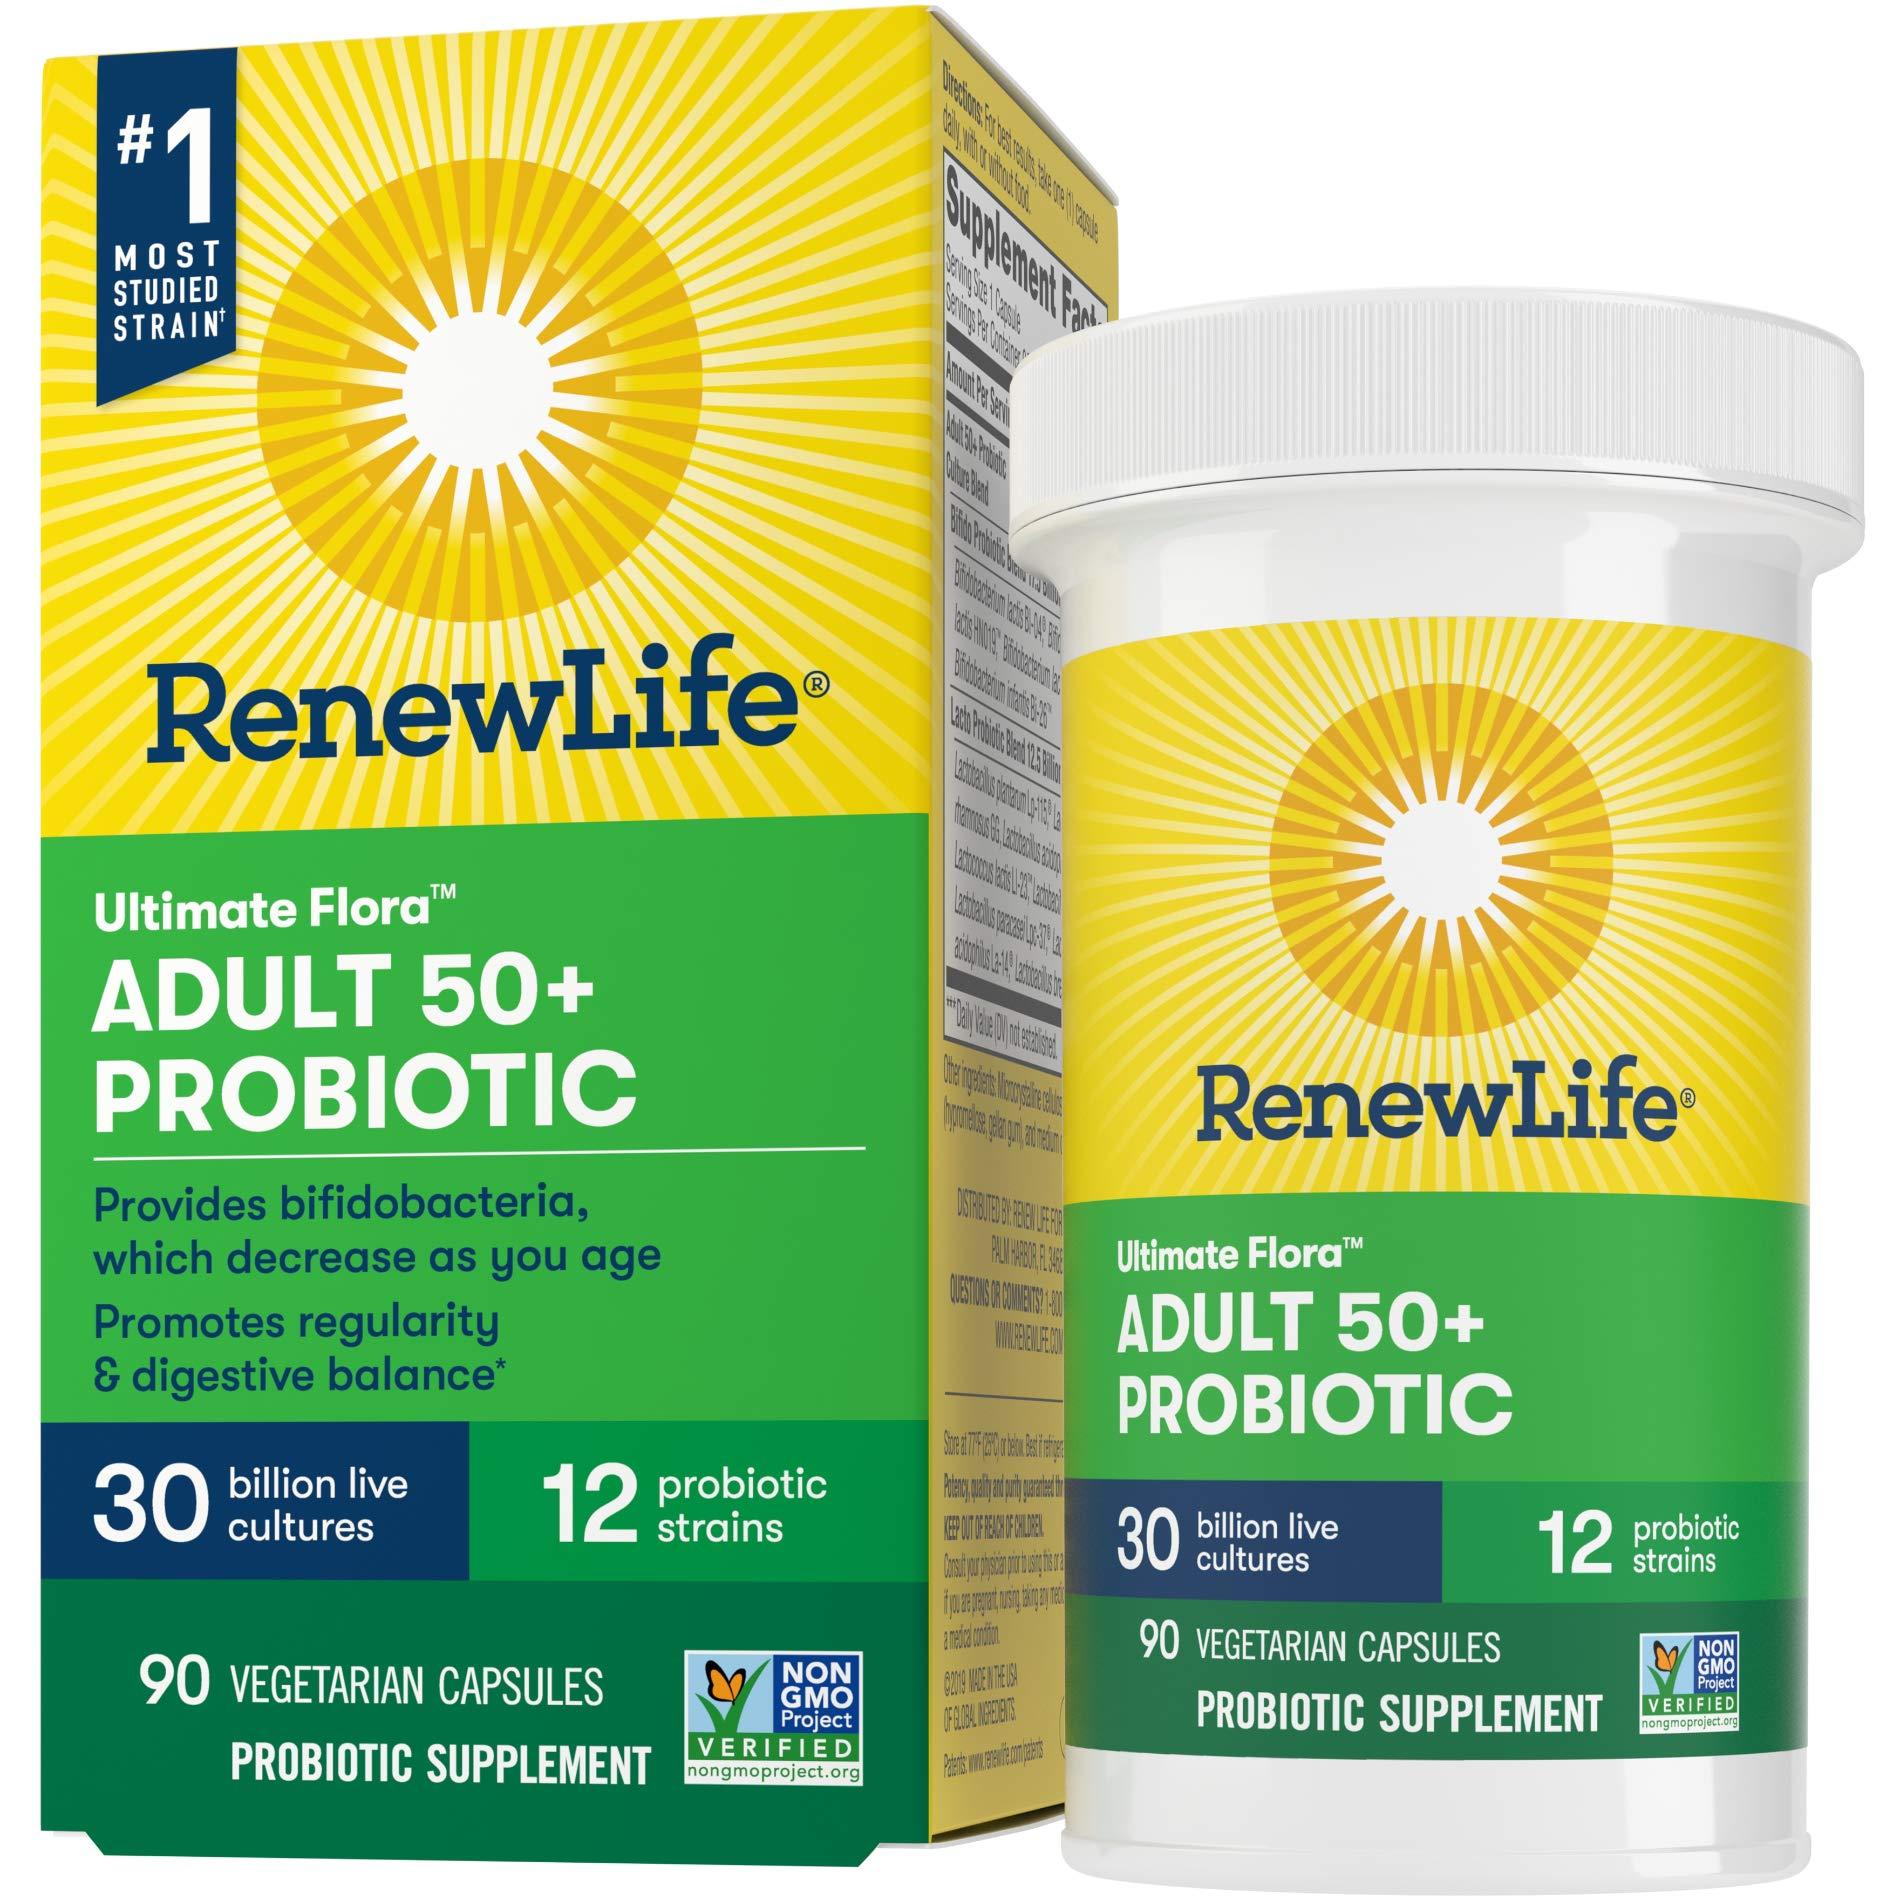 Renew Life Adult Probiotic - Ultimate Flora Adult 50+ Probiotic Supplement - Shelf Stable, Gluten, Dairy & Soy Free - 30 Billion CFU - 90 Vegetarian Capsules (packaging may vary)